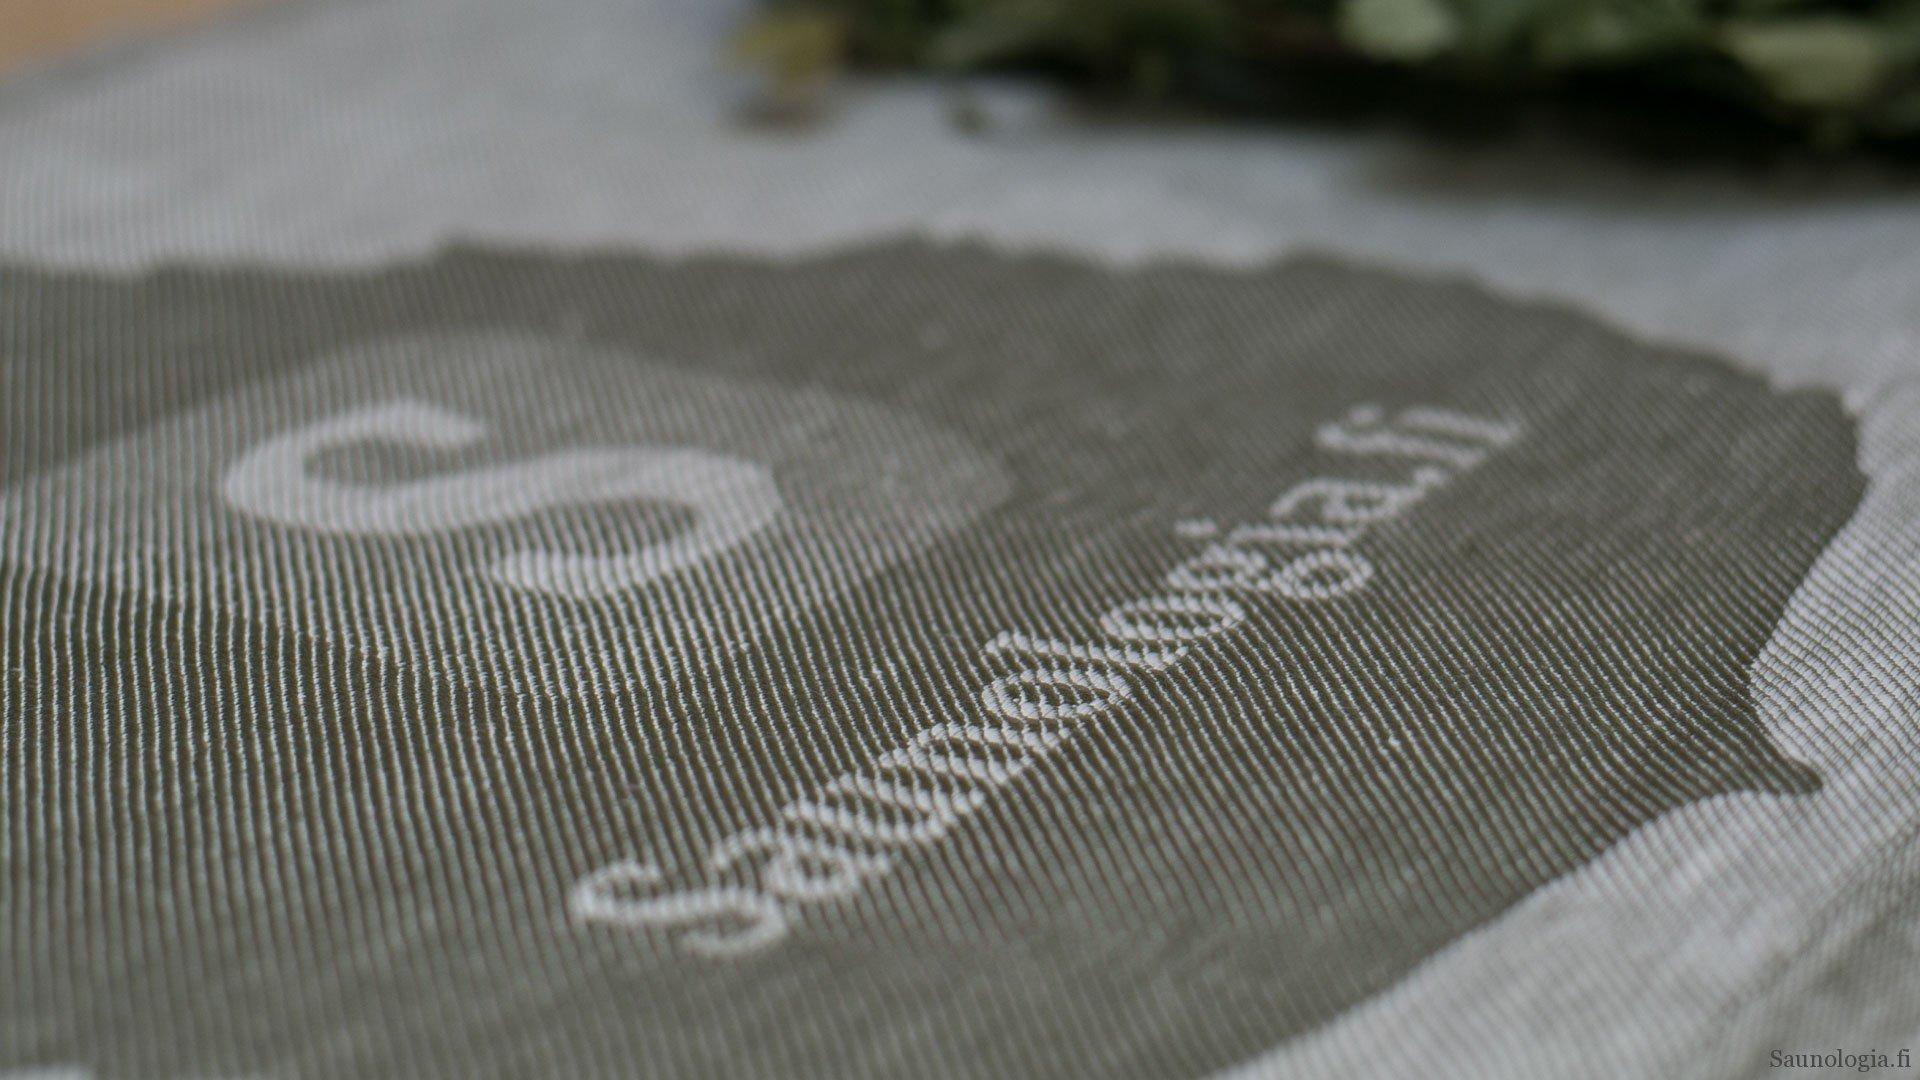 180103-saunologia-pellava-detail